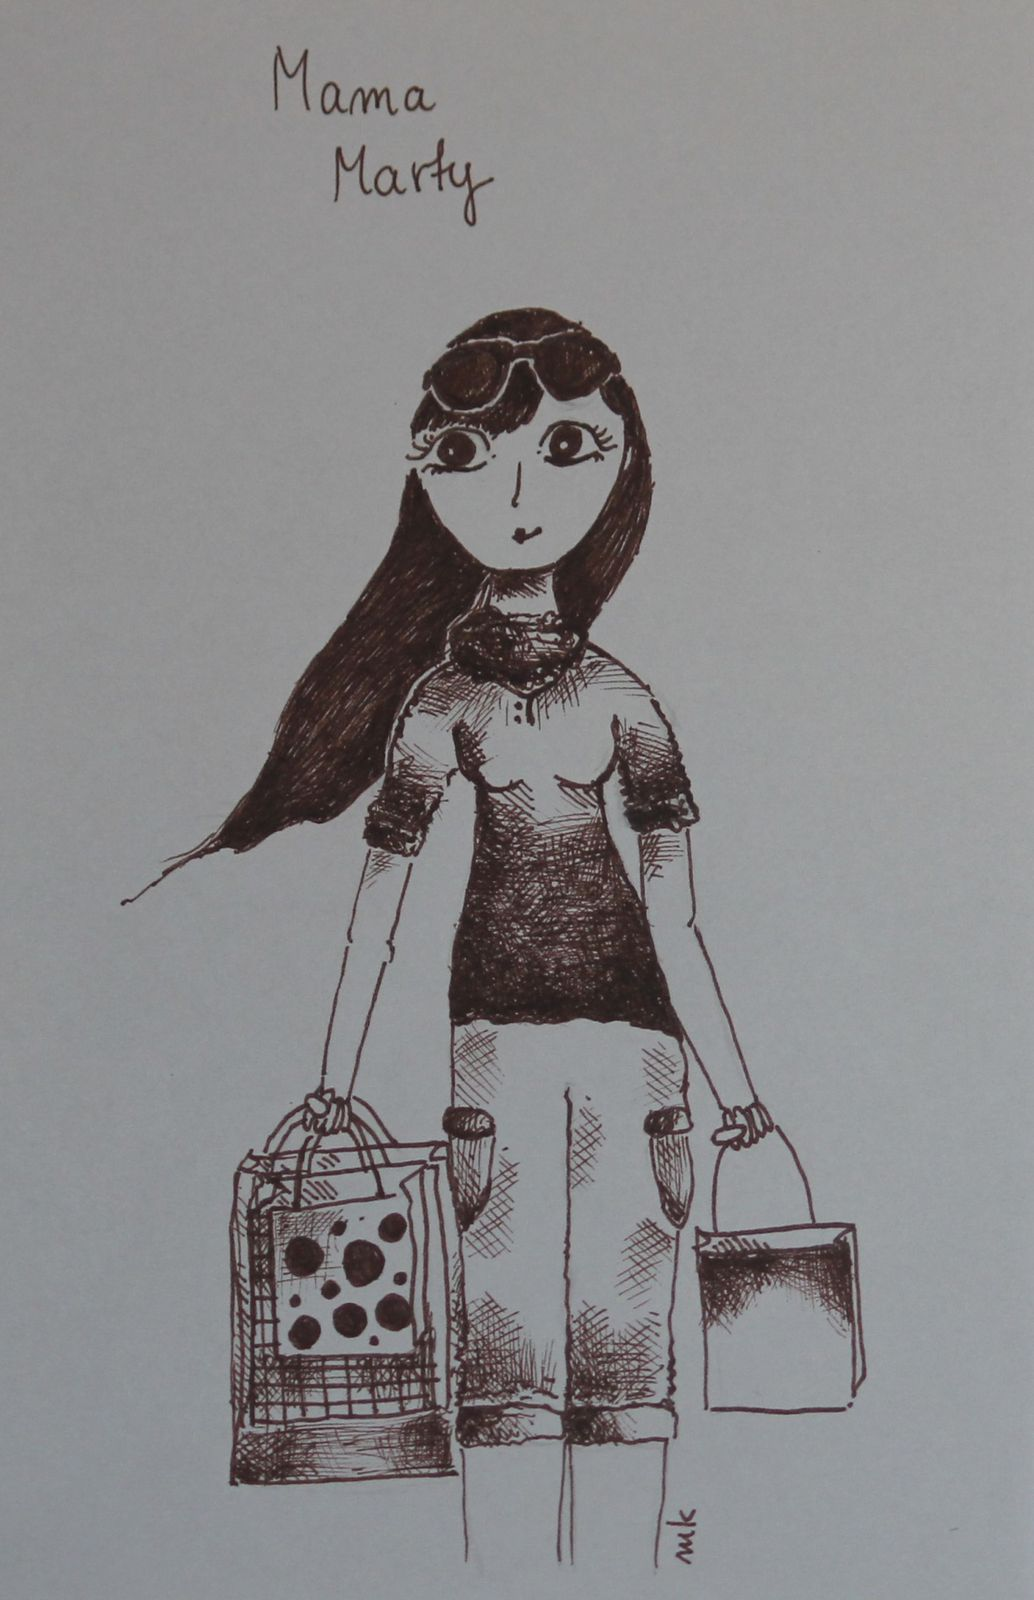 Mama Marty - Emilka lat 13